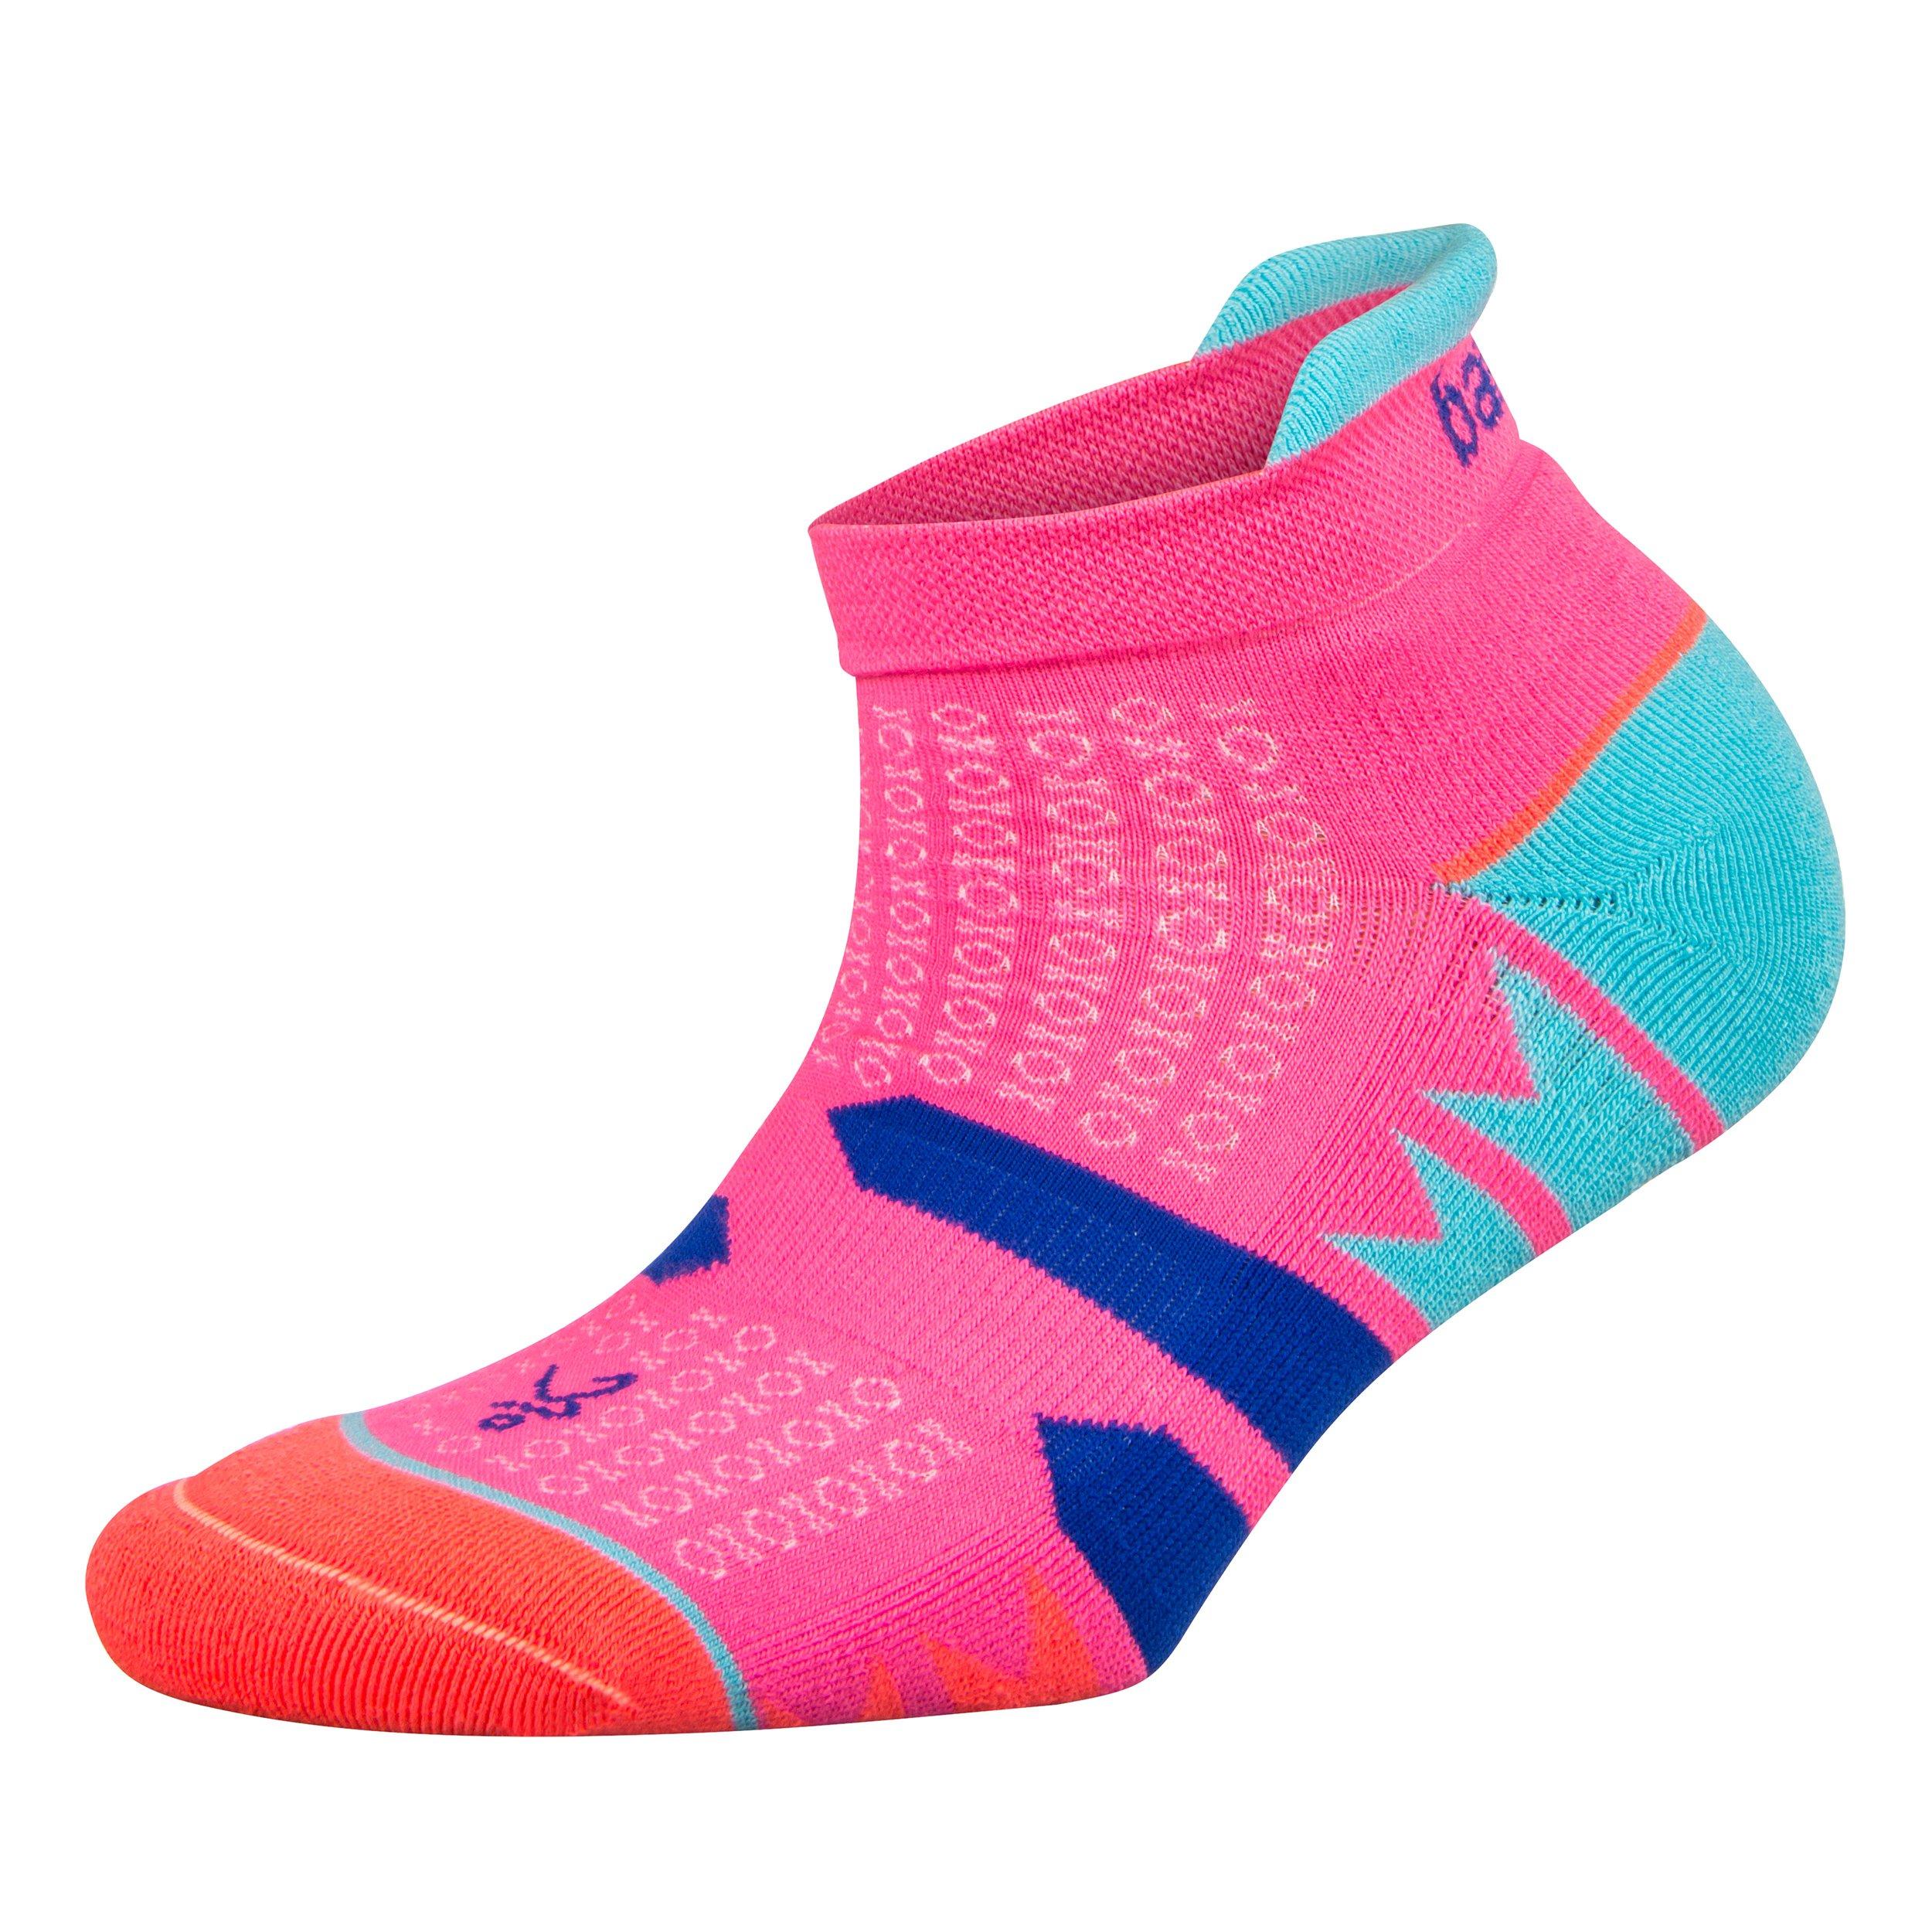 Balega Women's Enduro No Show Socks (1 Pair), Watermelon/Orange, Medium by Balega (Image #1)